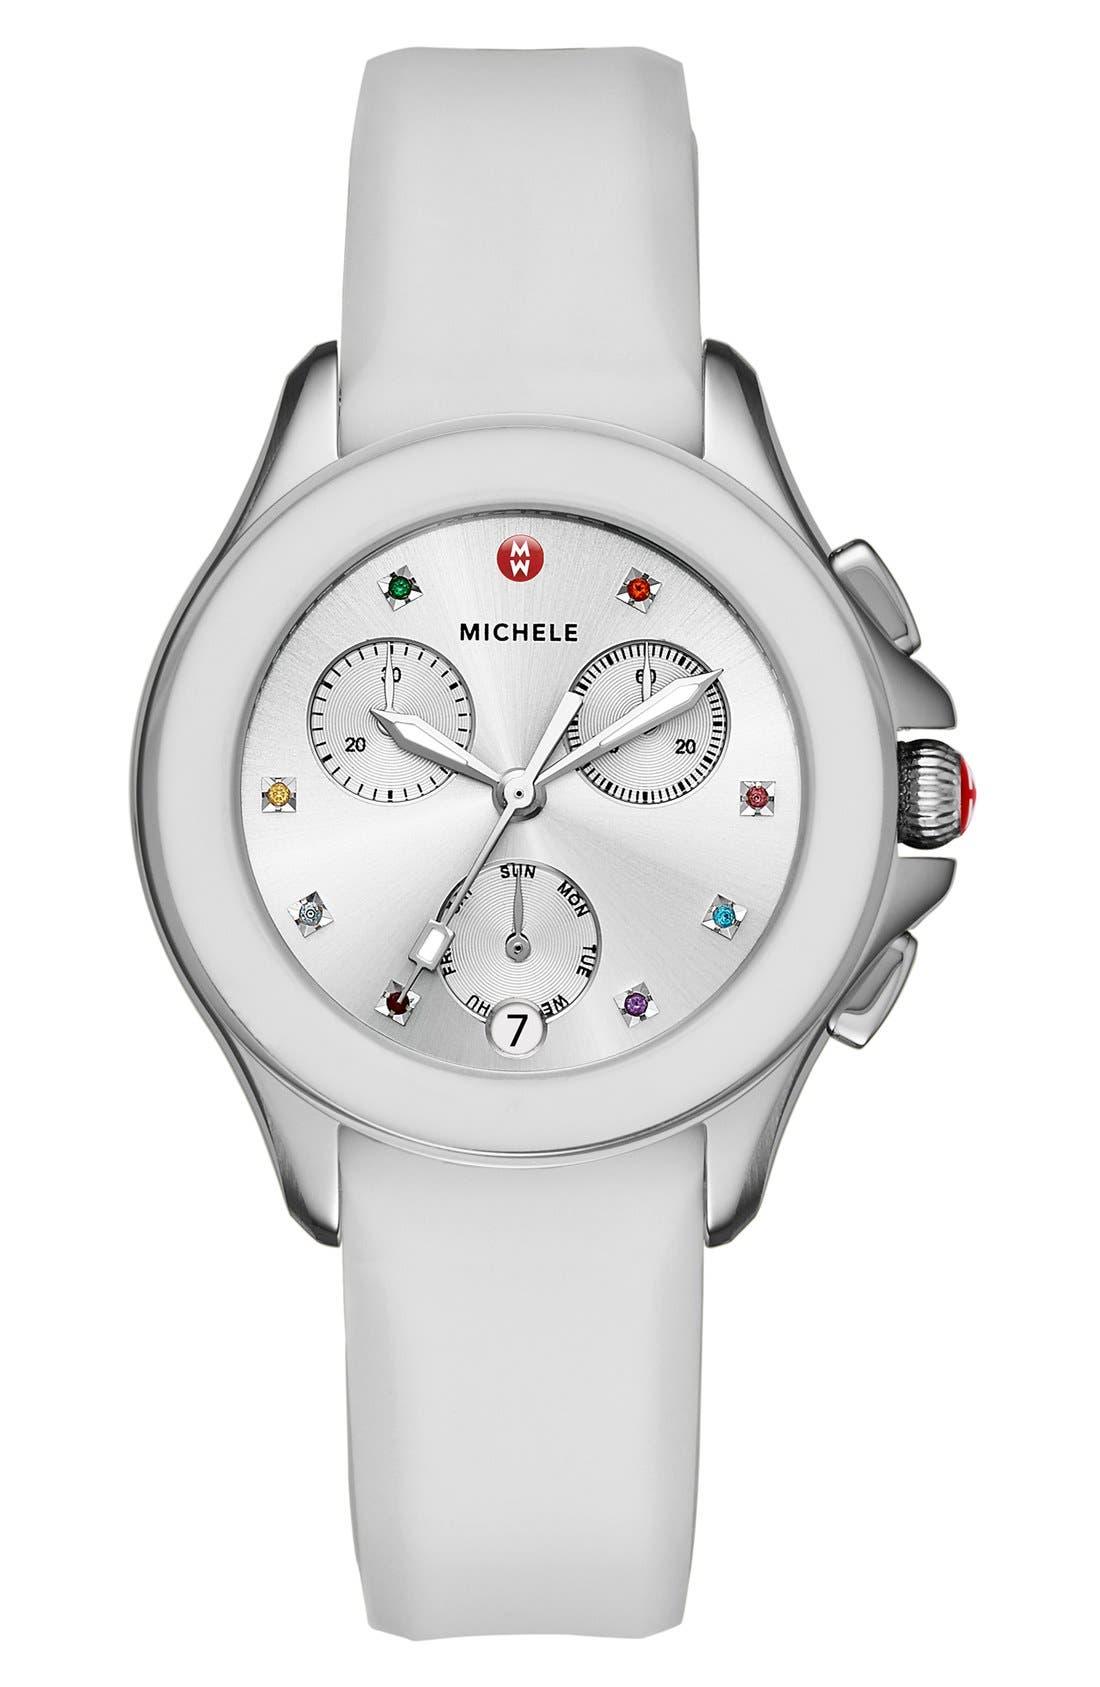 MICHELE Cape Chronograph Silicone Strap Watch, 34mm